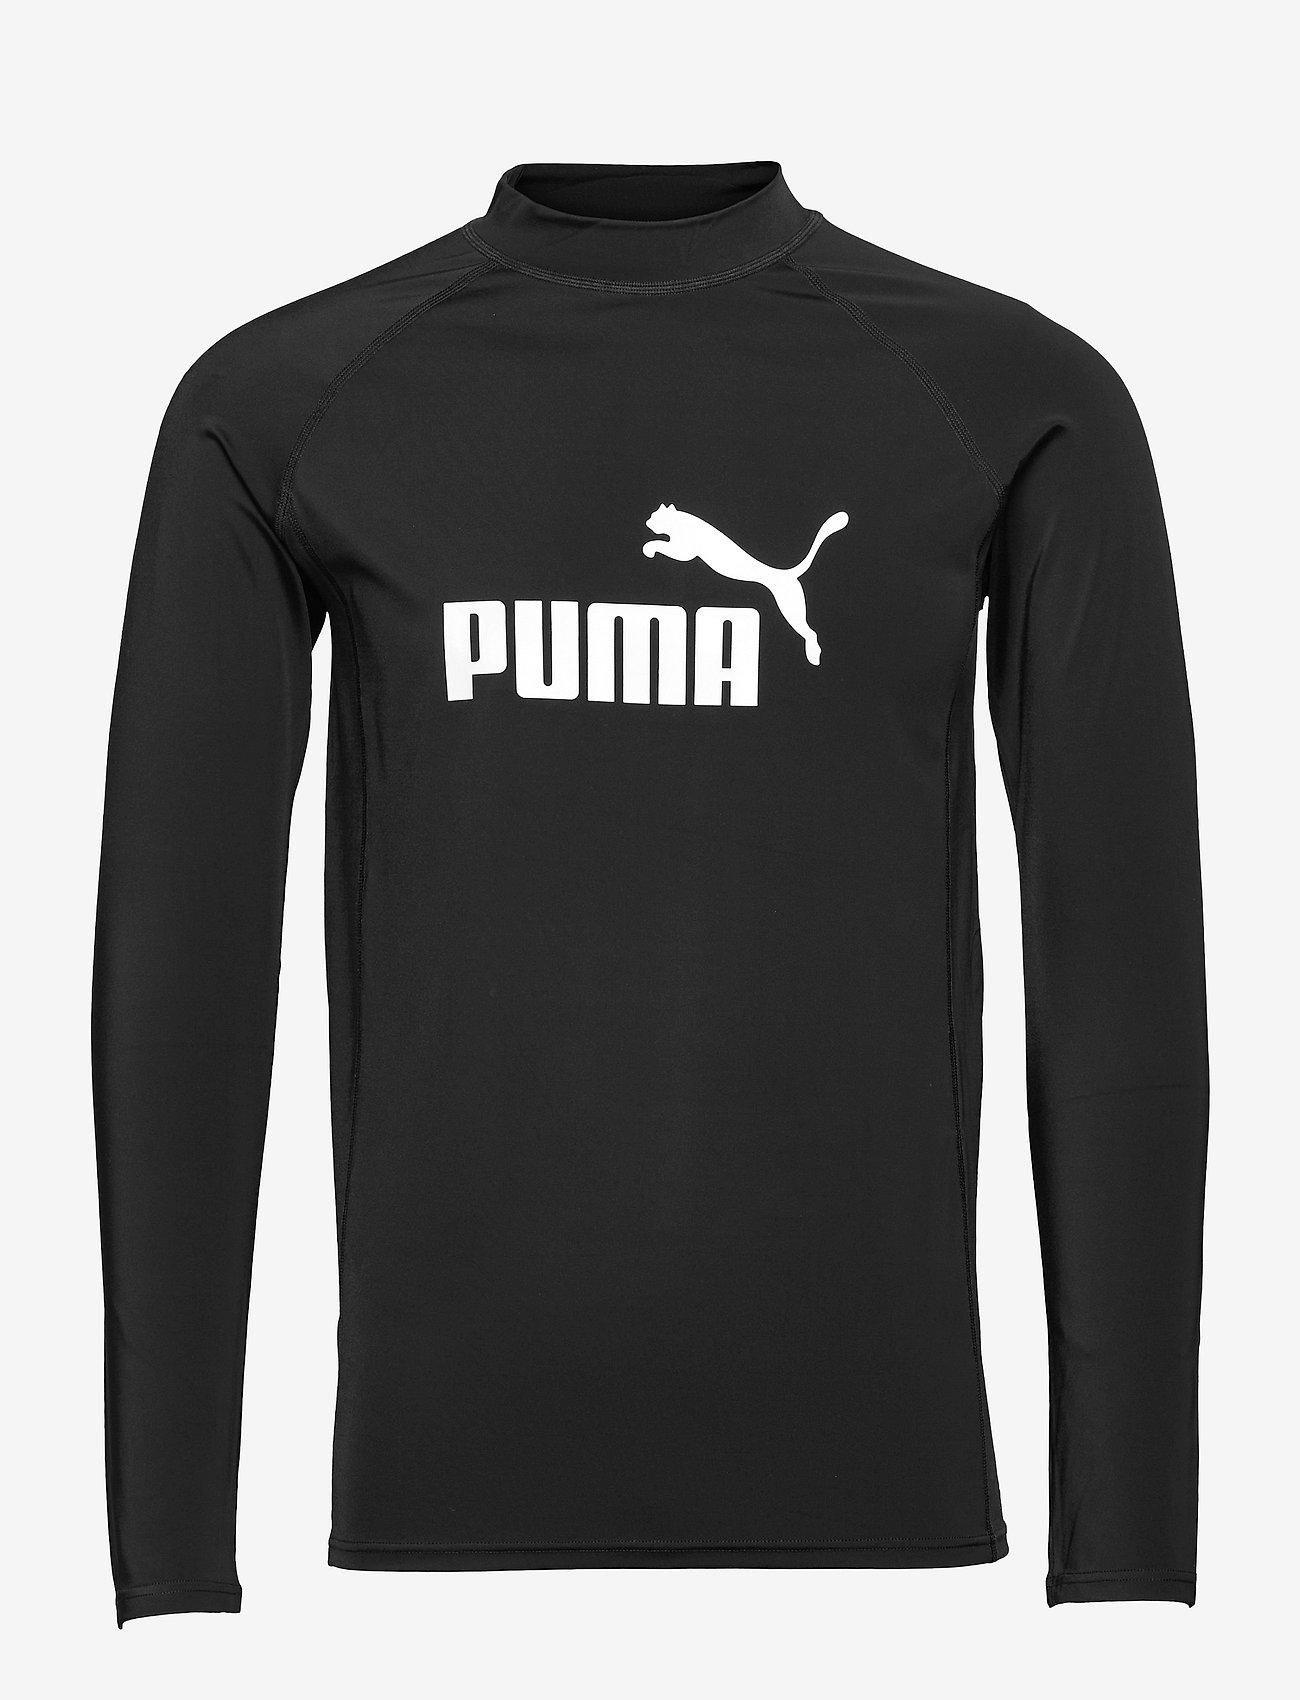 Puma Swim - PUMA SWIM MEN LONG SLEEVE RASH GUAR - top met lange mouwen - black - 0